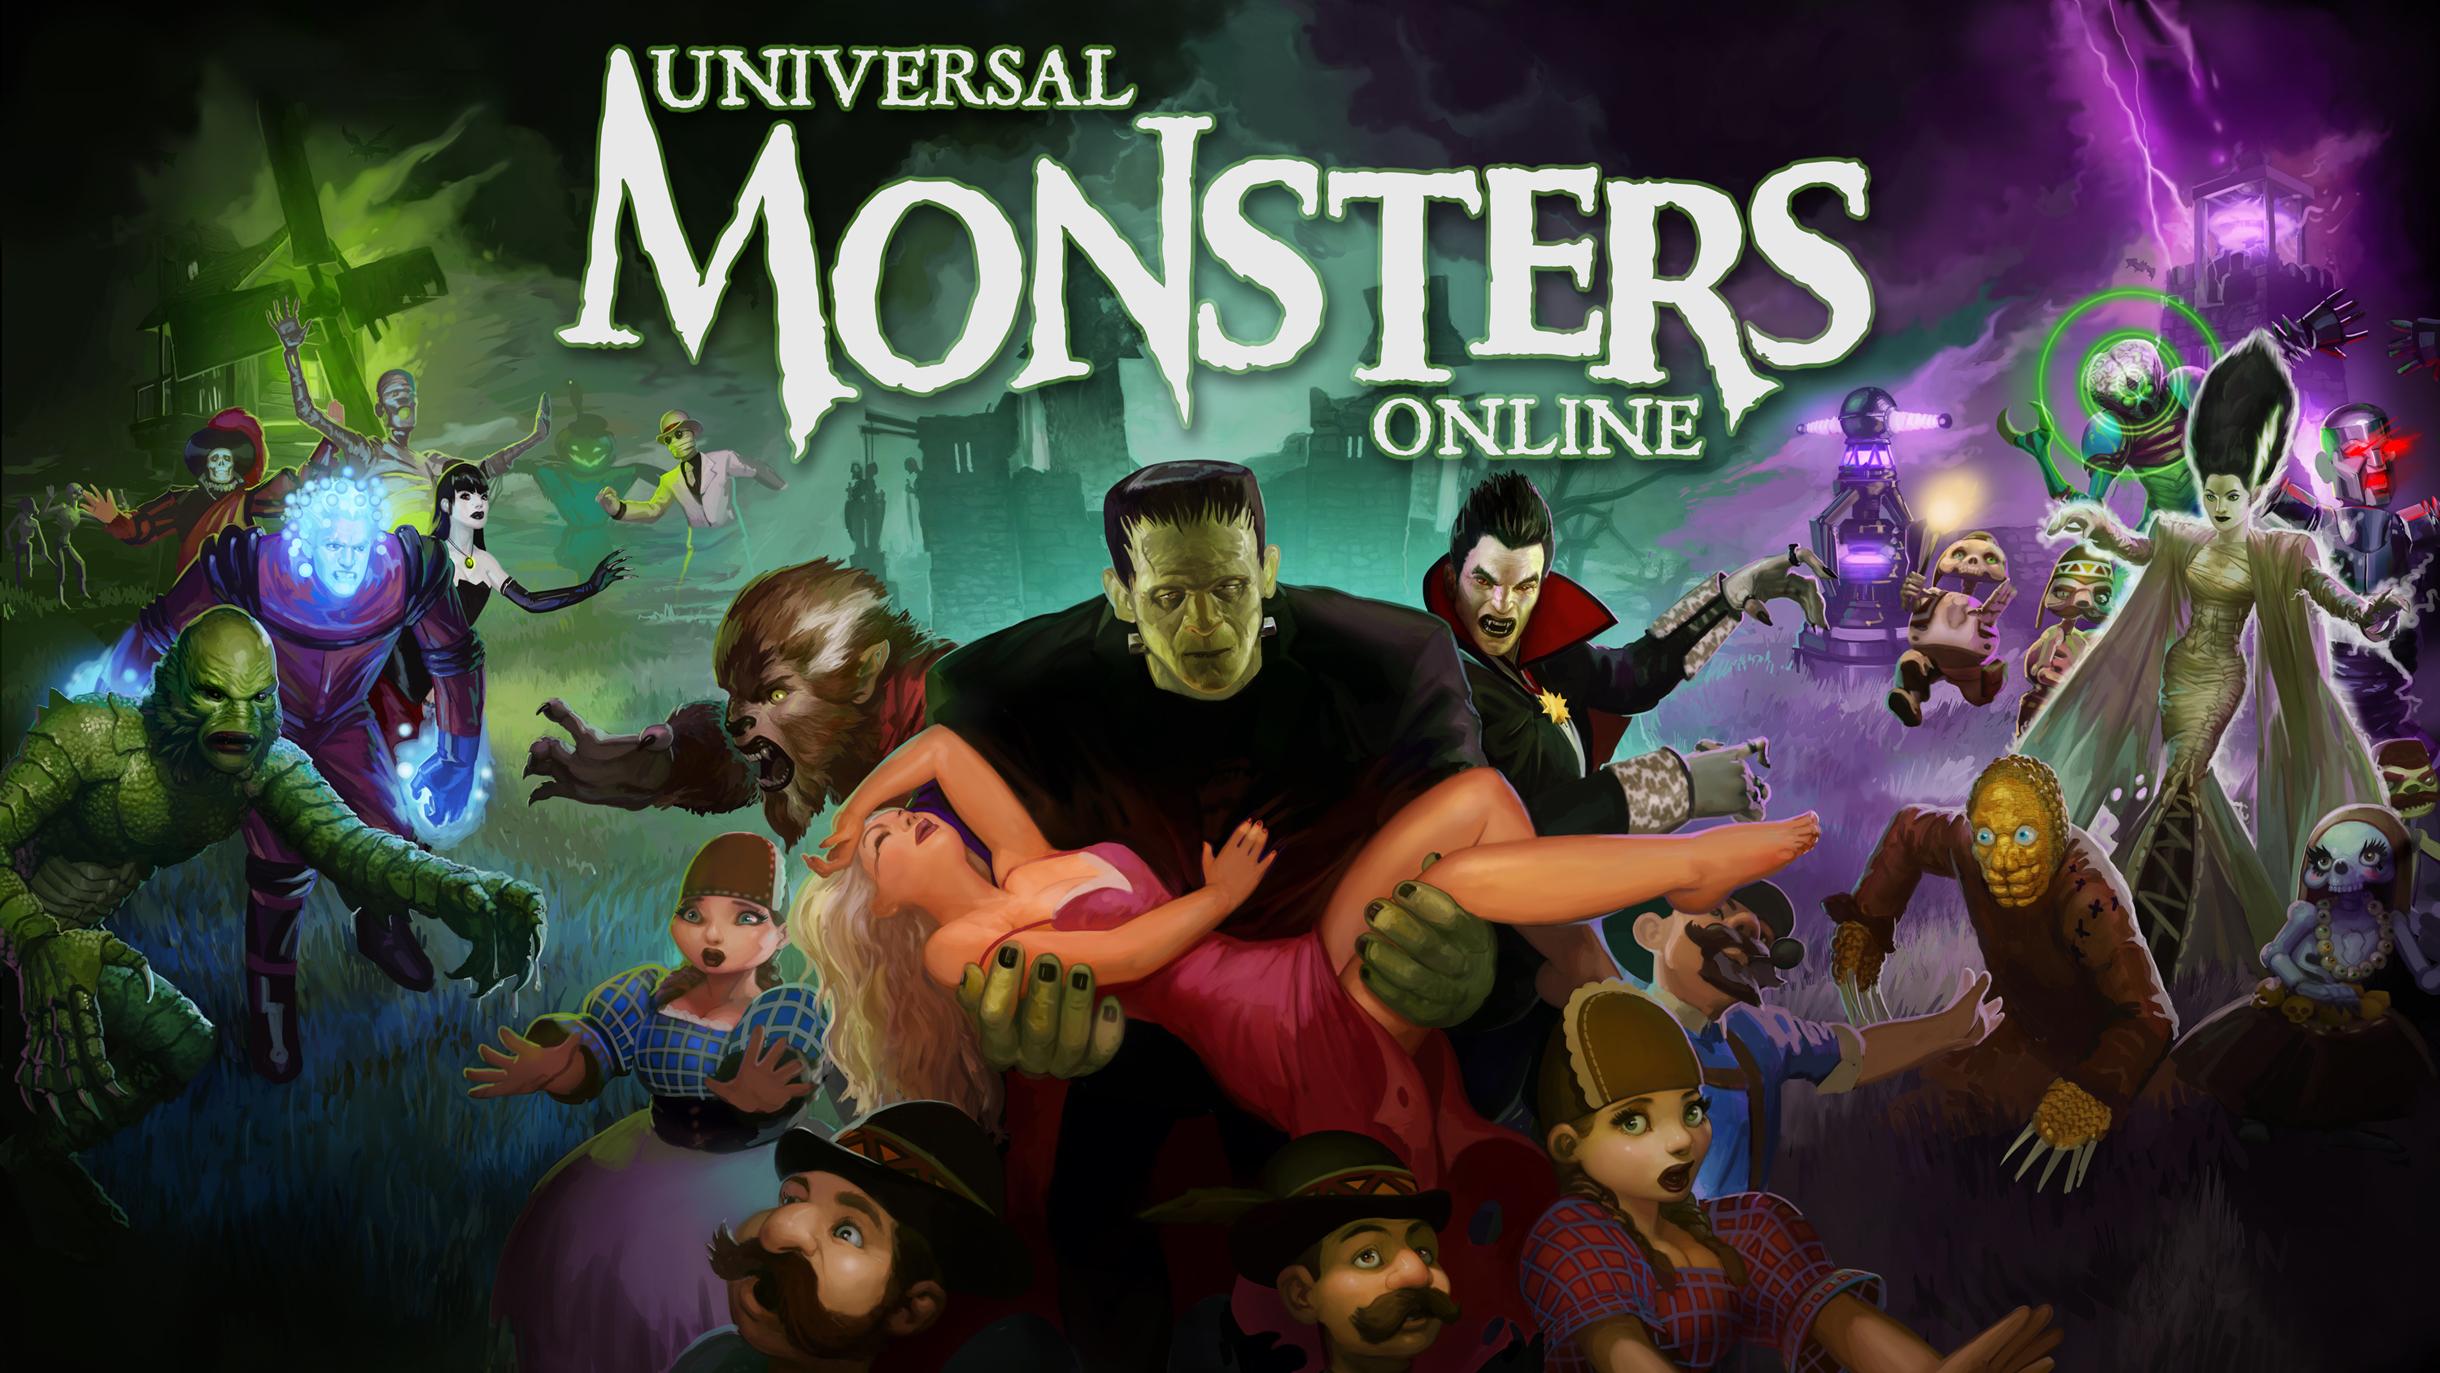 Universal Monsters Logo On universal monsters 2440x1373